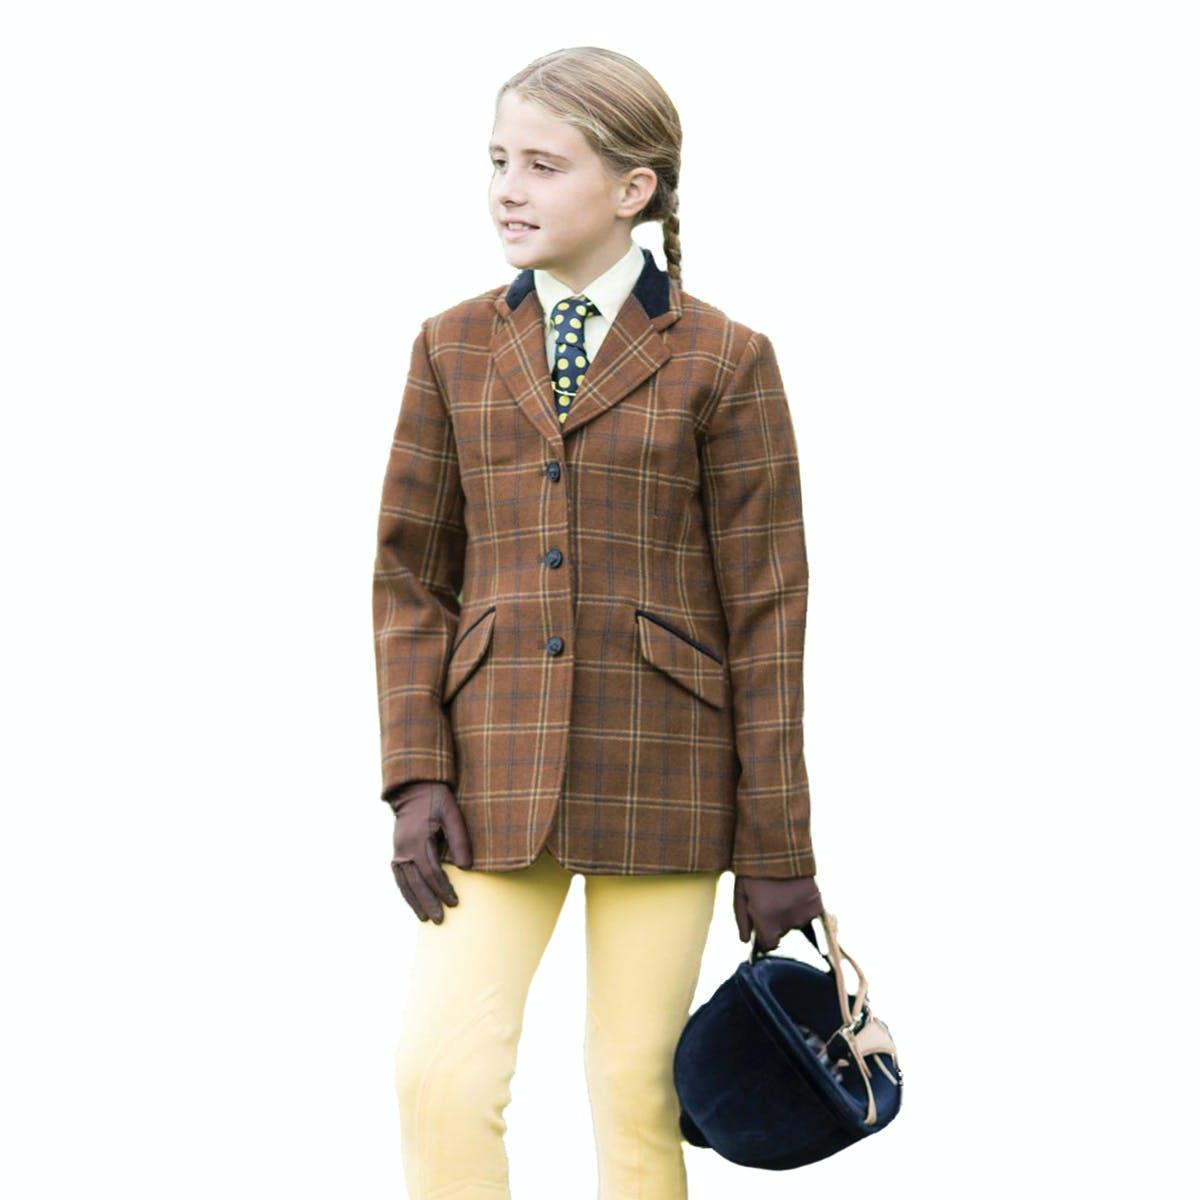 Equetech Marlow Deluxe Tweed Kids Tweed Jackets From Rideaway